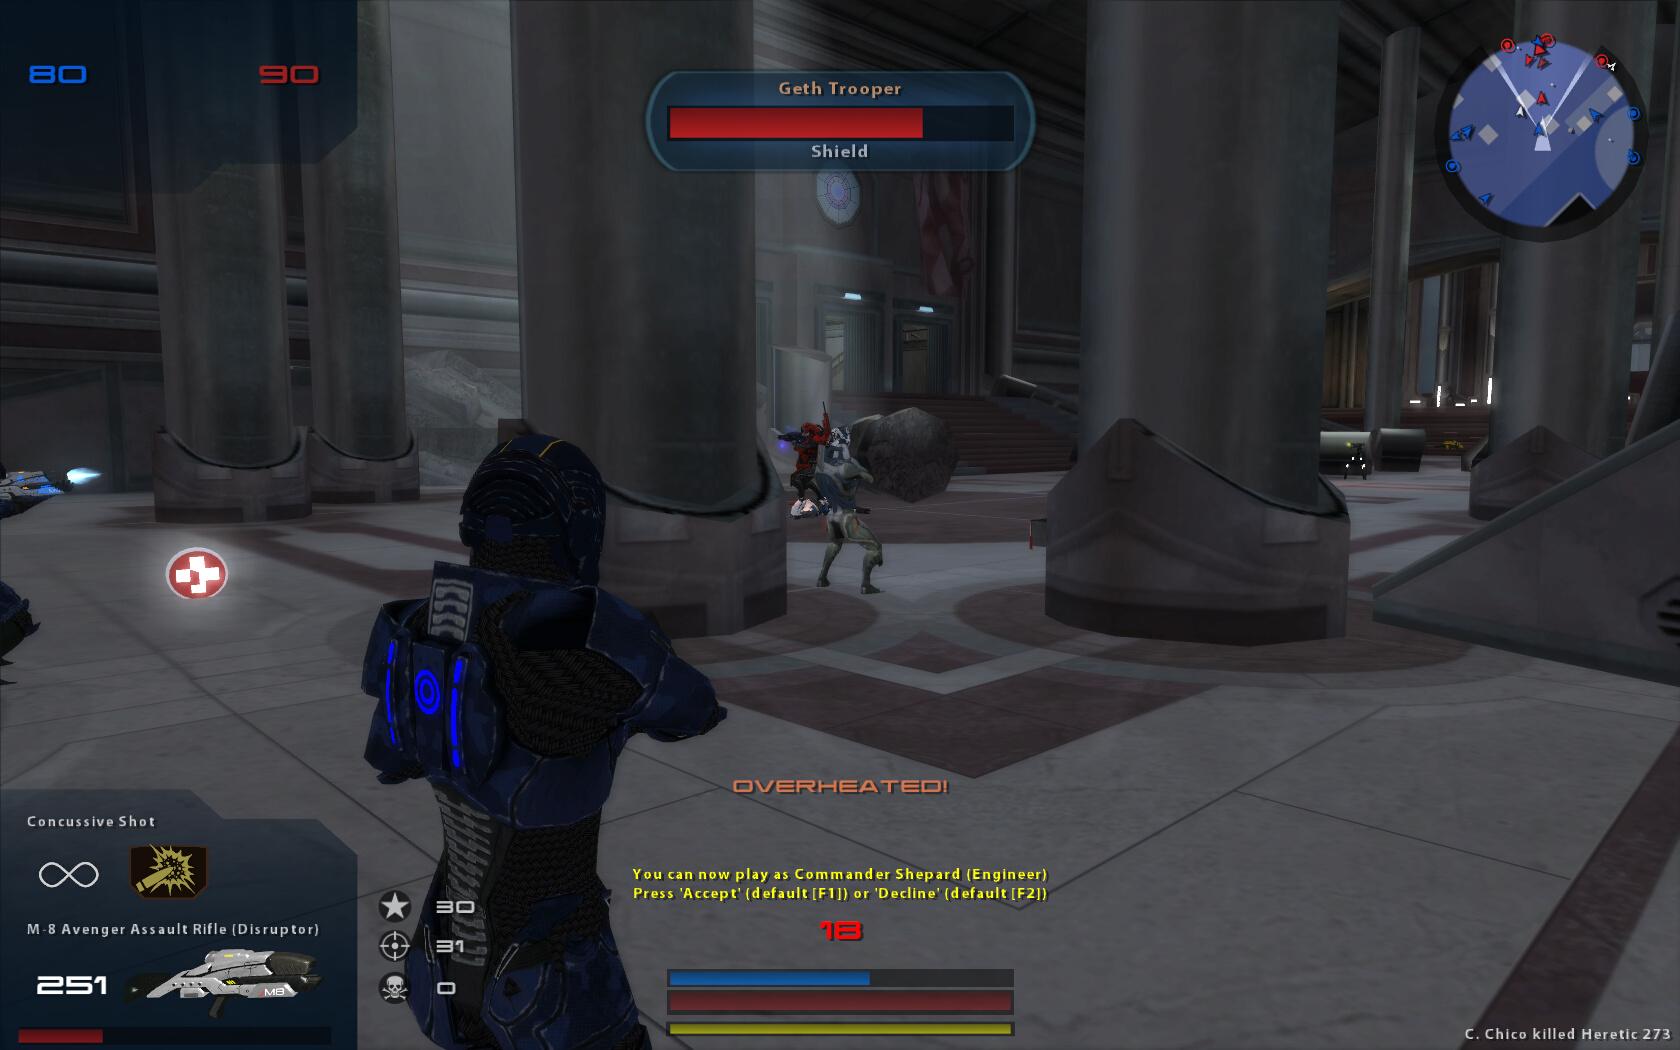 New Hud V2 Image Mass Effect Unification Mod For Star